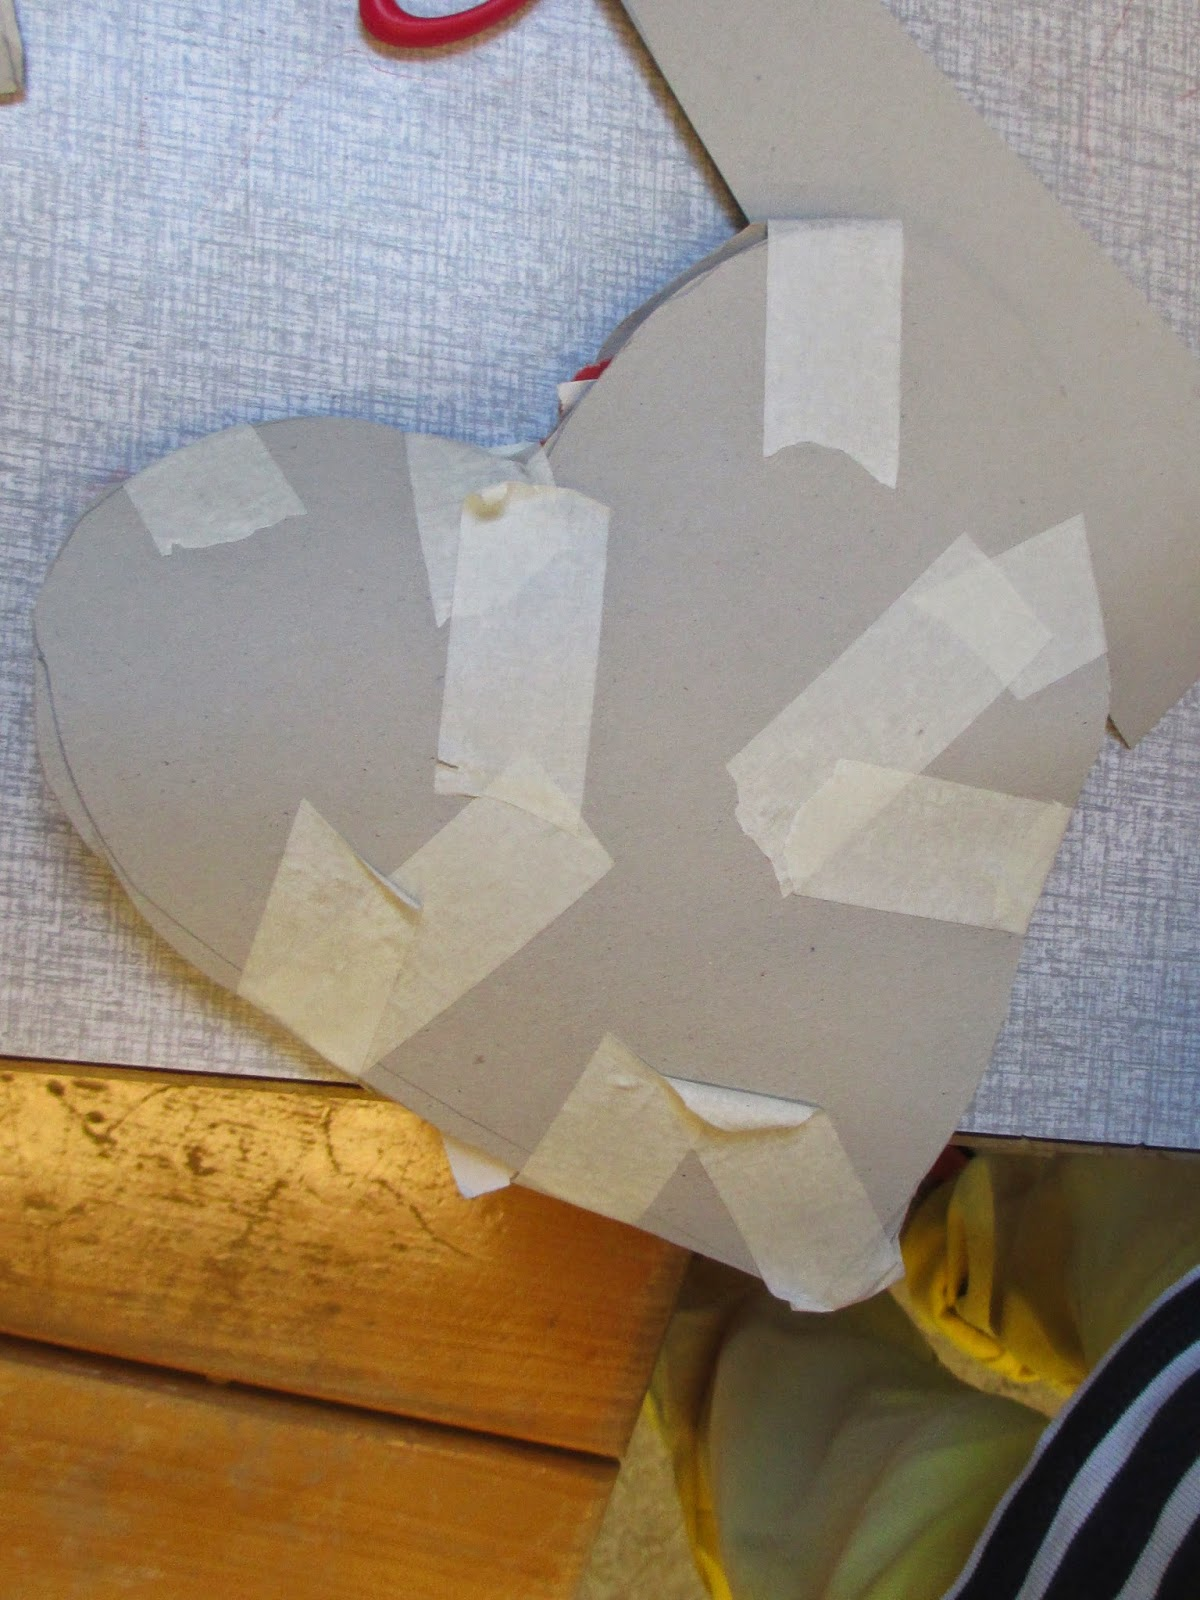 Herzschablone fertig